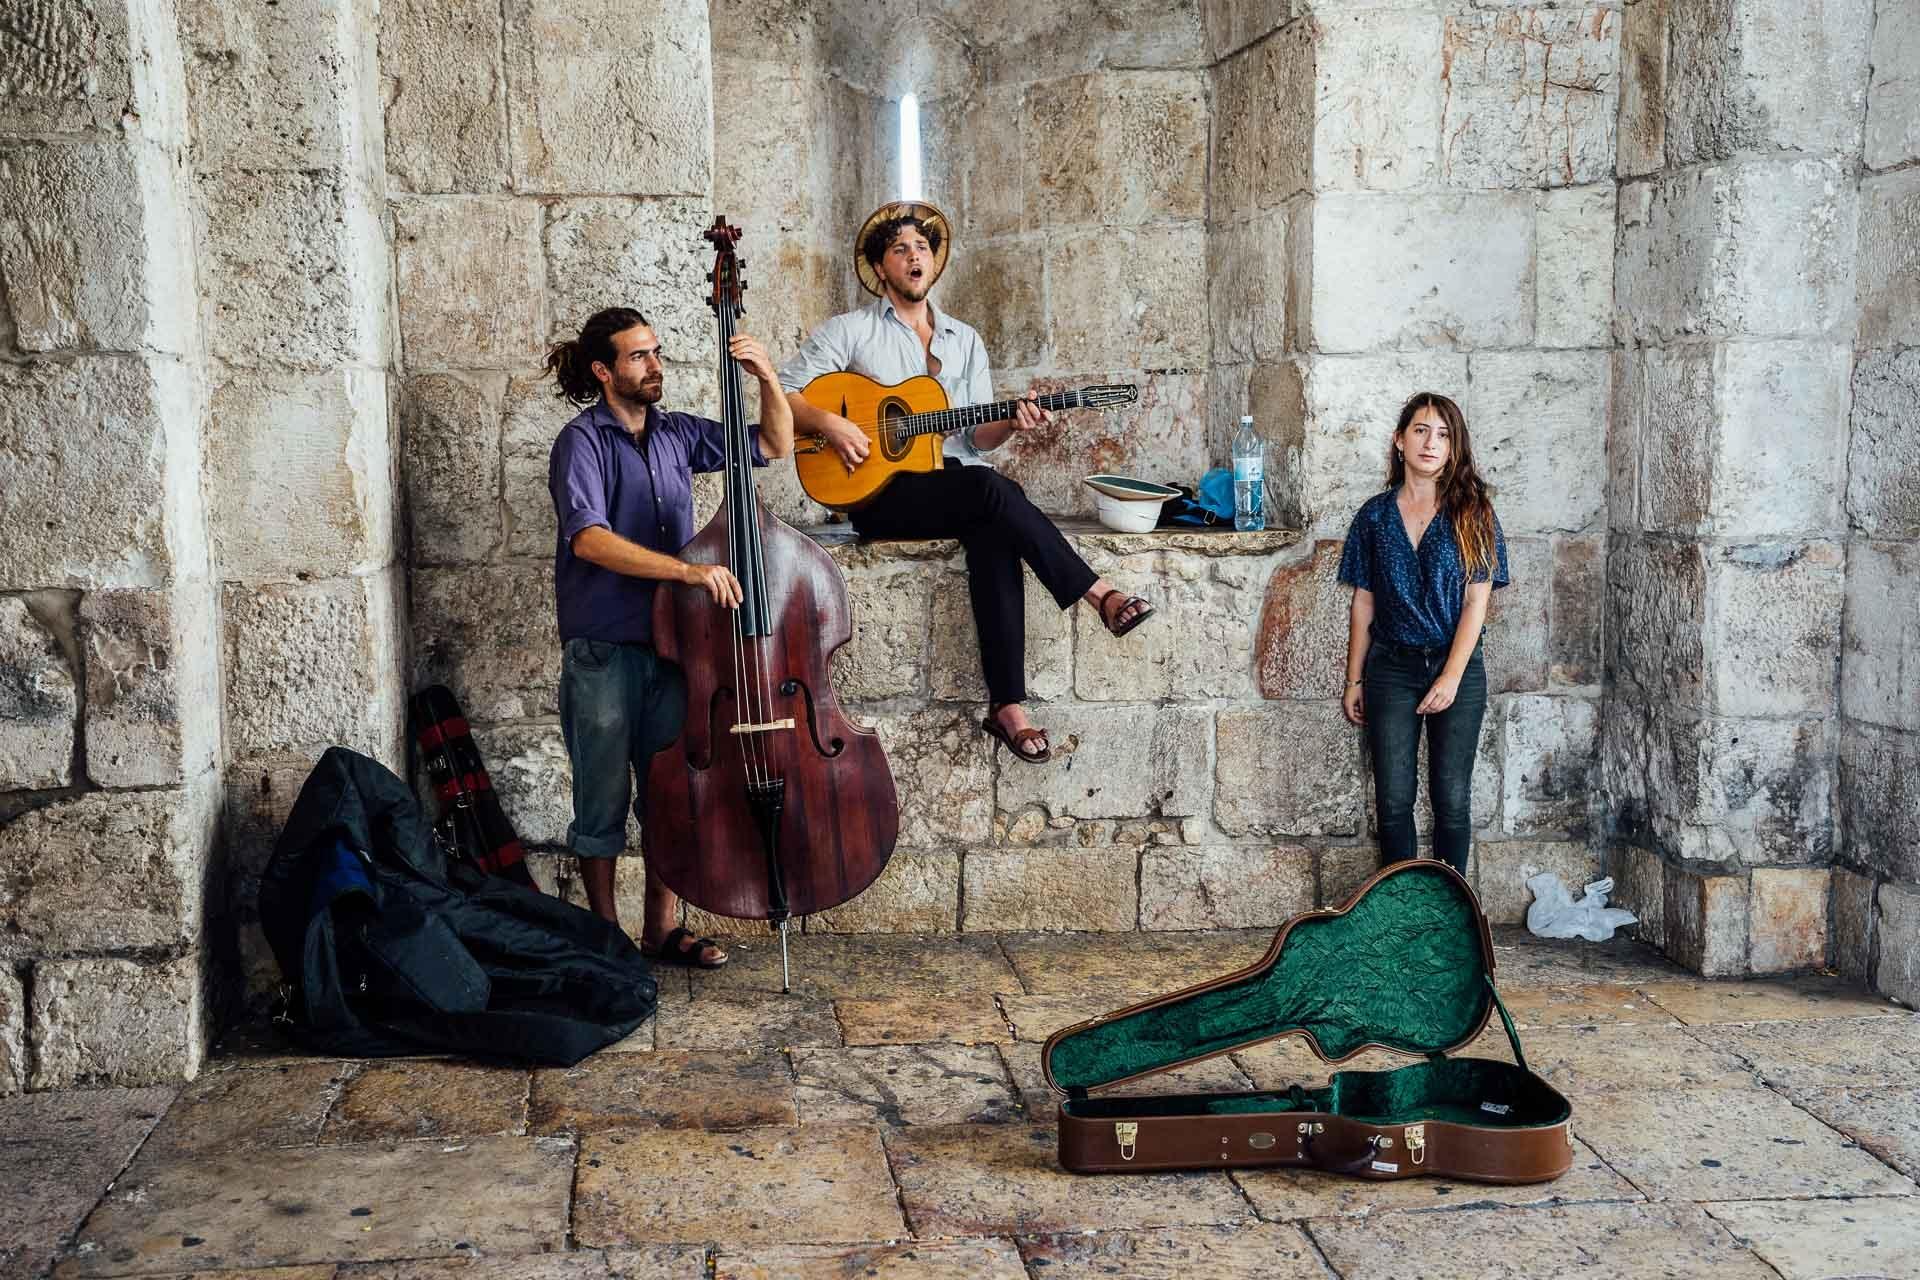 Israel Street Musicians Singer Jerusalem Busker-1121502